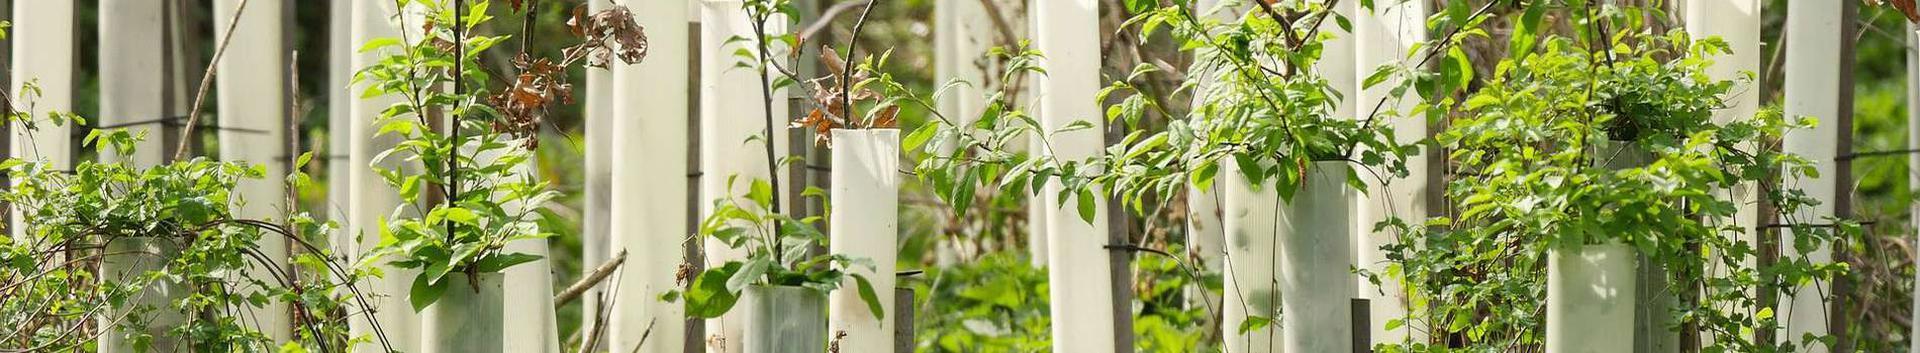 01291_muude-taimede-kasvatus_65252406_xl.jpg